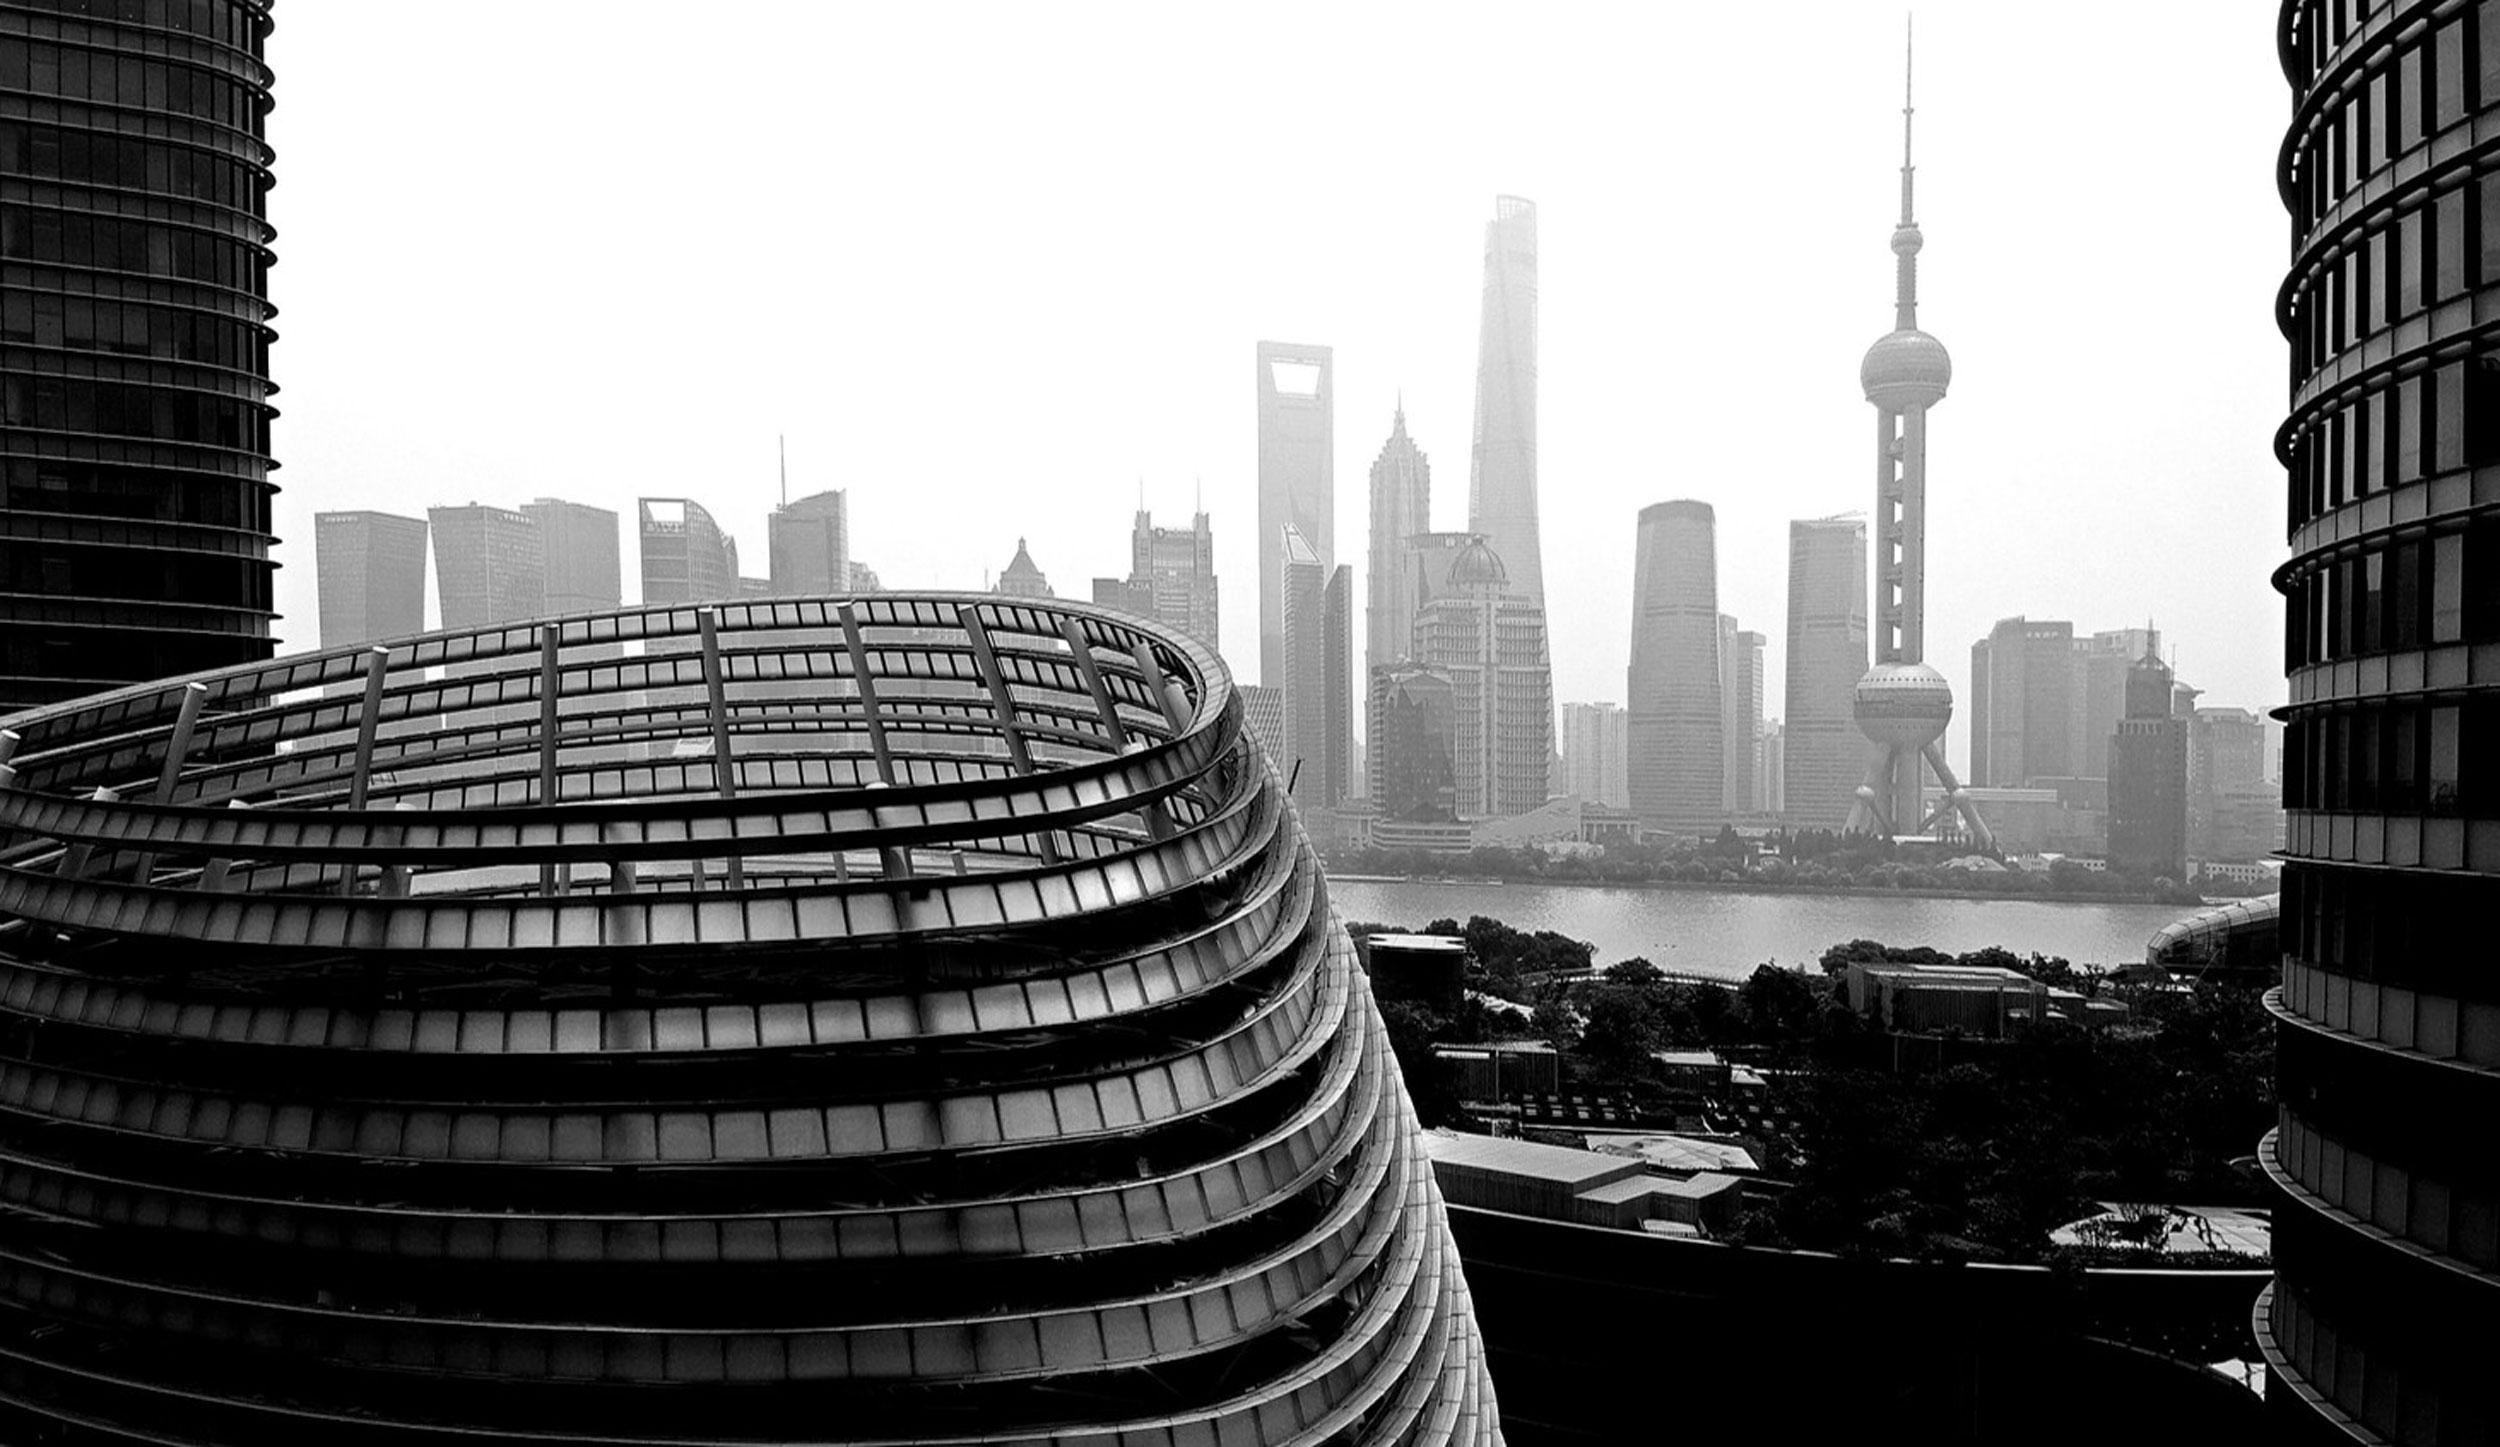 designworks studio in front of shanghai skyline